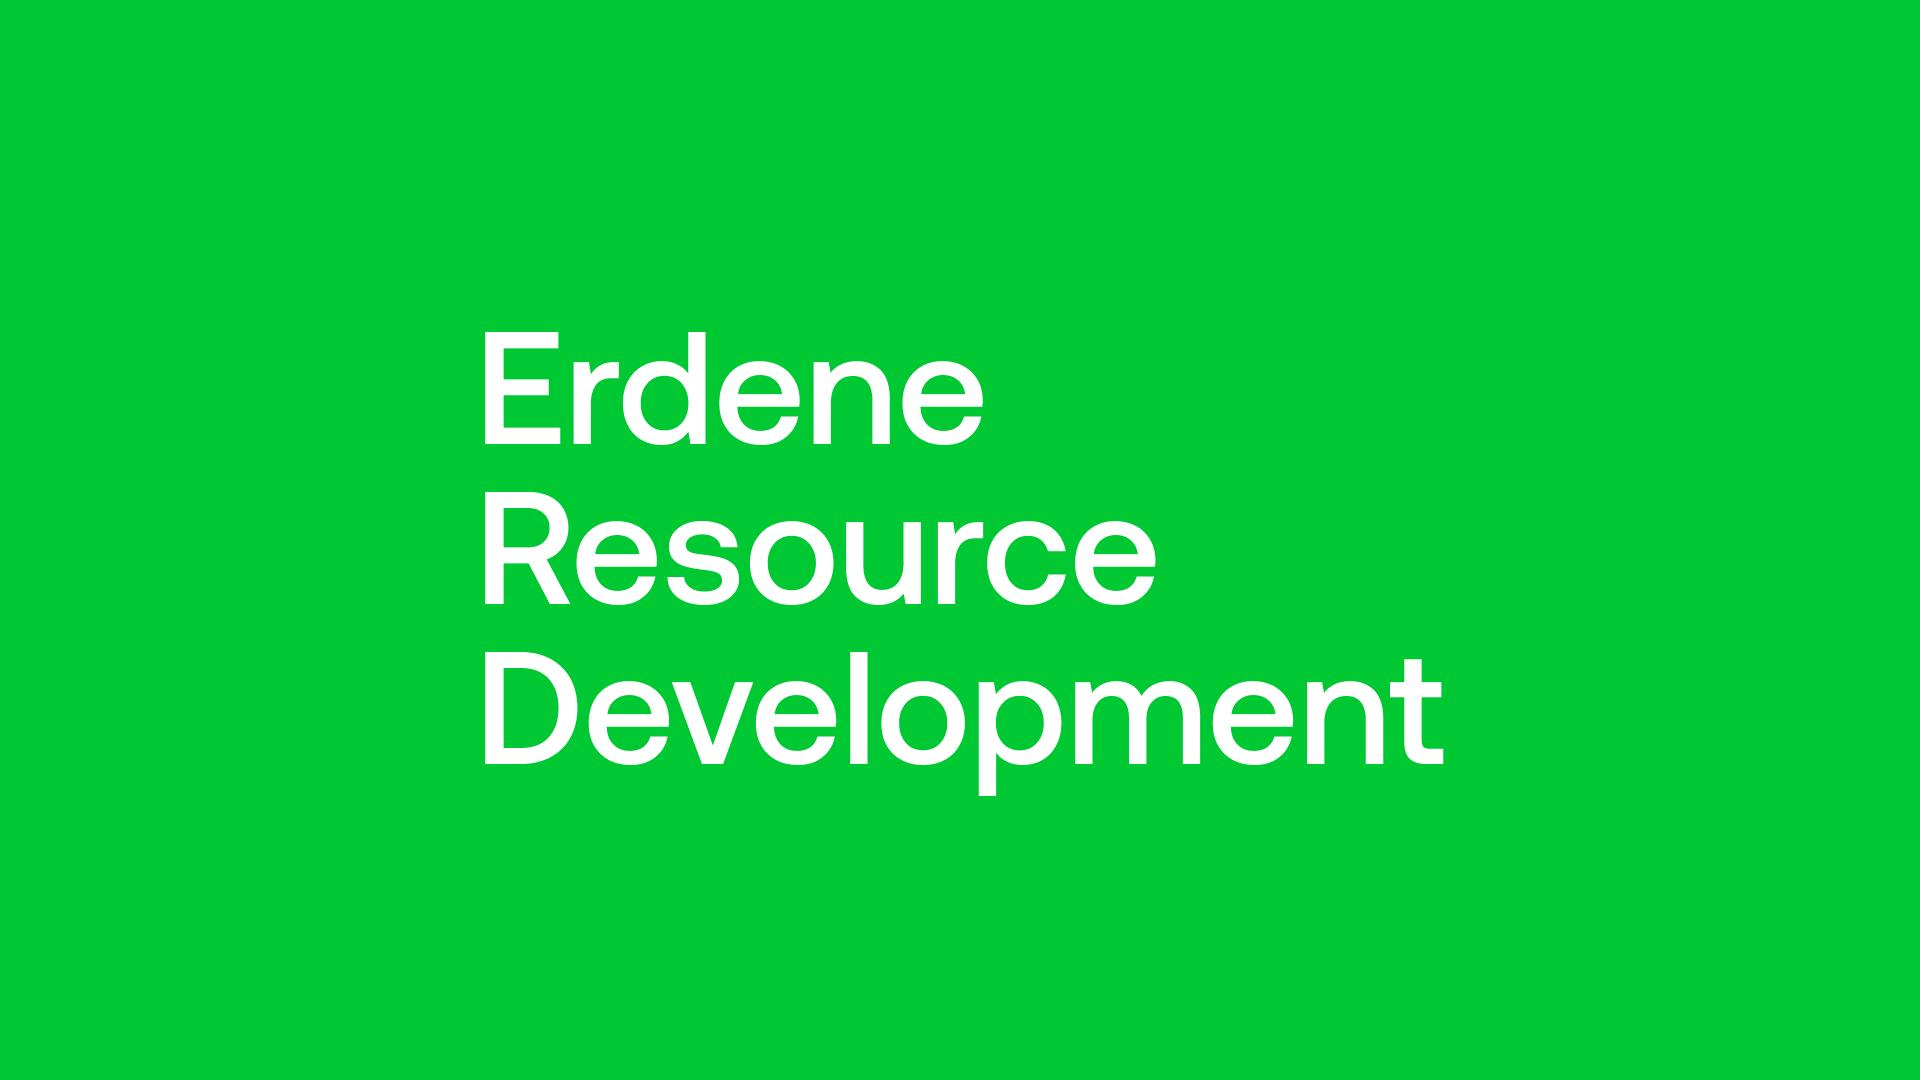 Erdene Resource Development (ERD) - Shovel Ready Gold in Open Pit